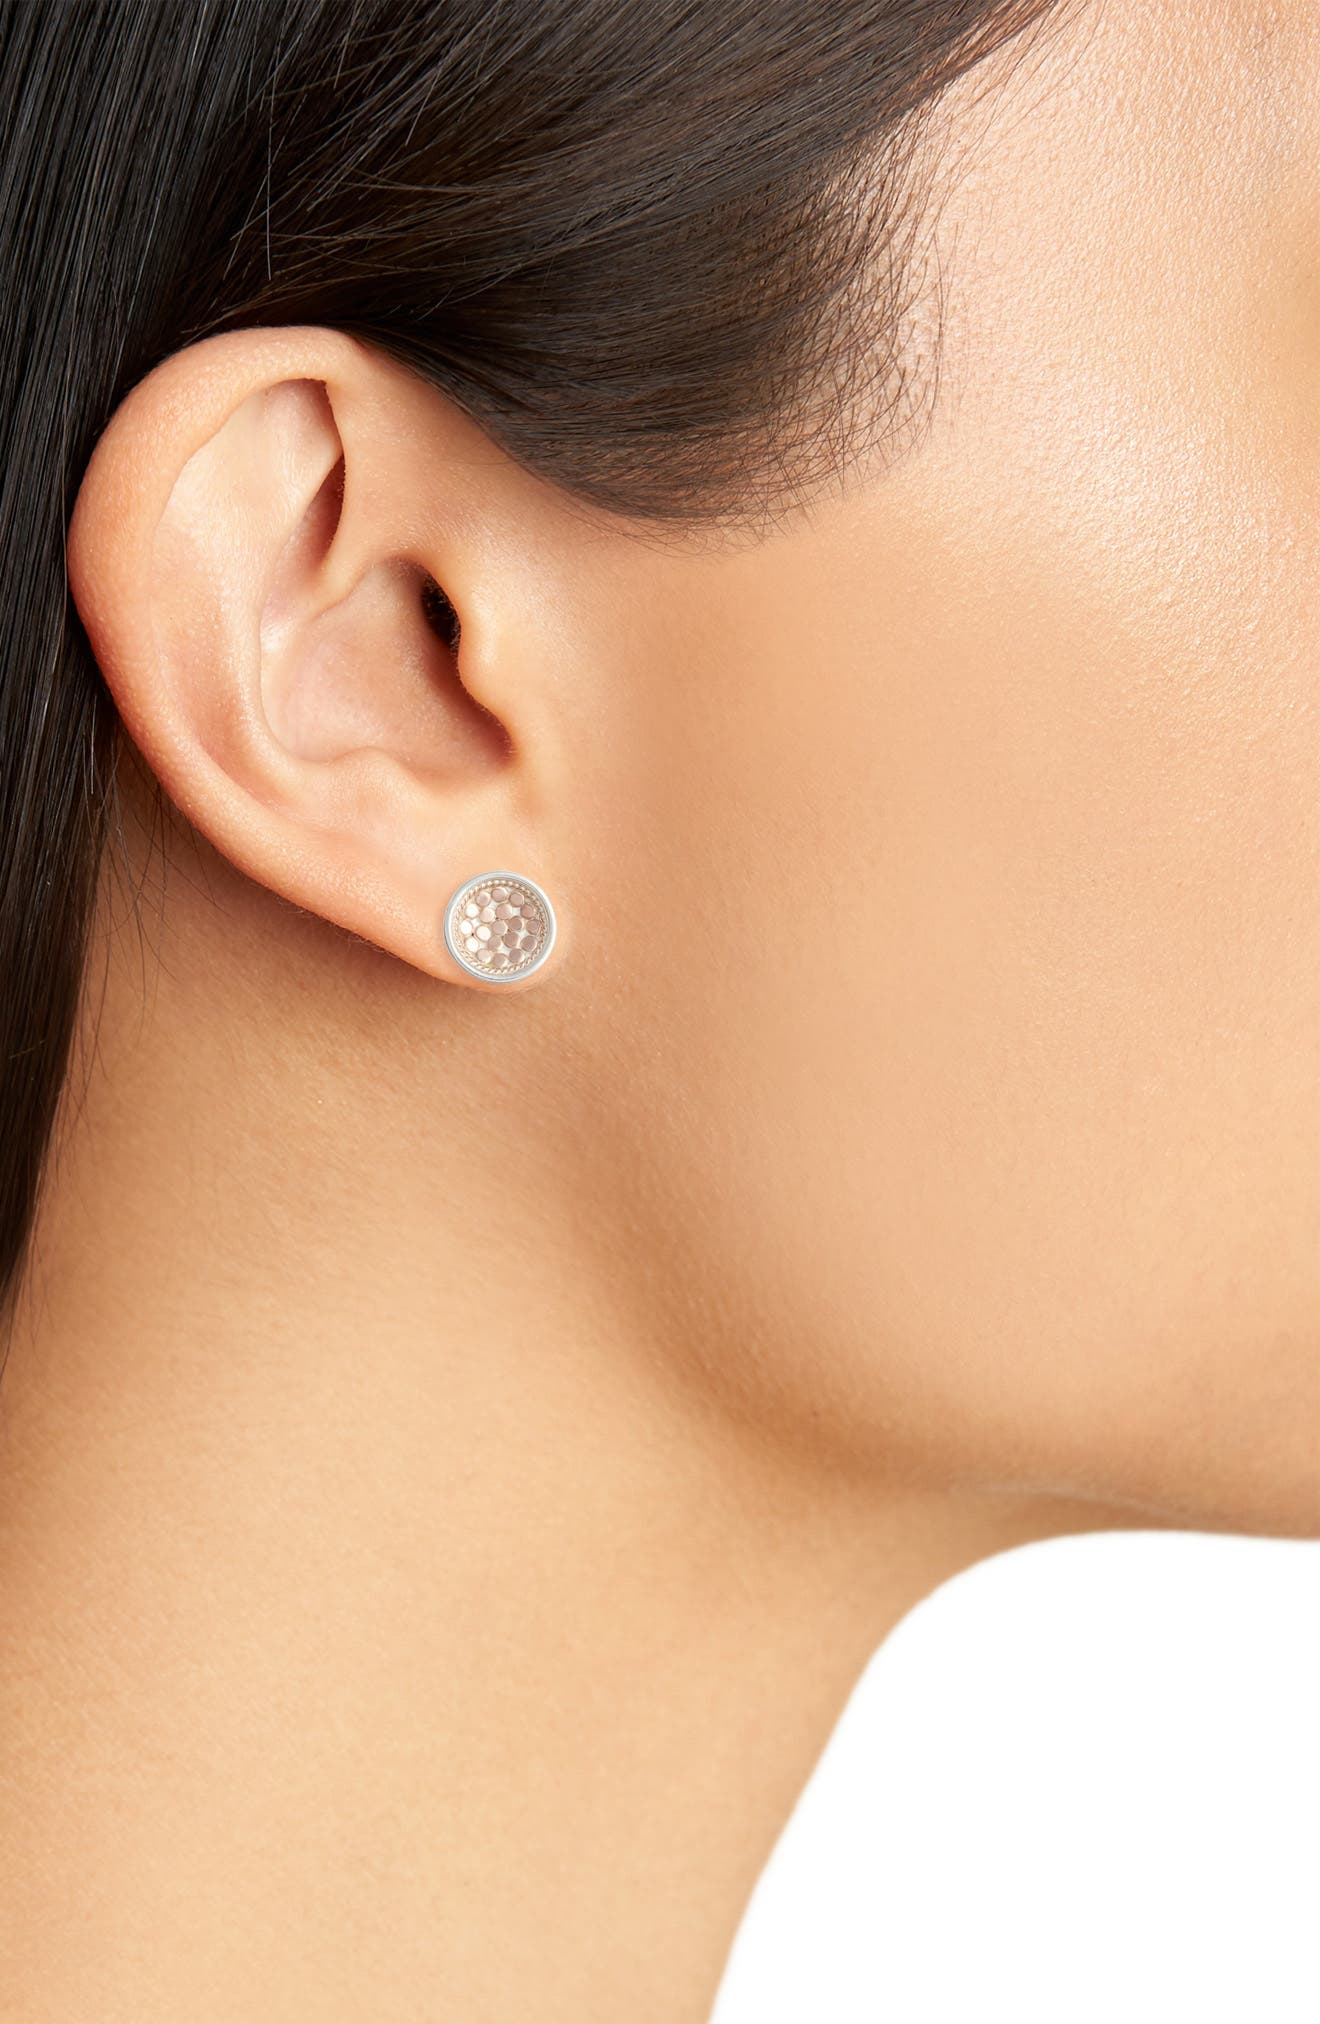 'Gili' Small Dish Stud Earrings,                             Alternate thumbnail 2, color,                             Rose Gold/ Silver